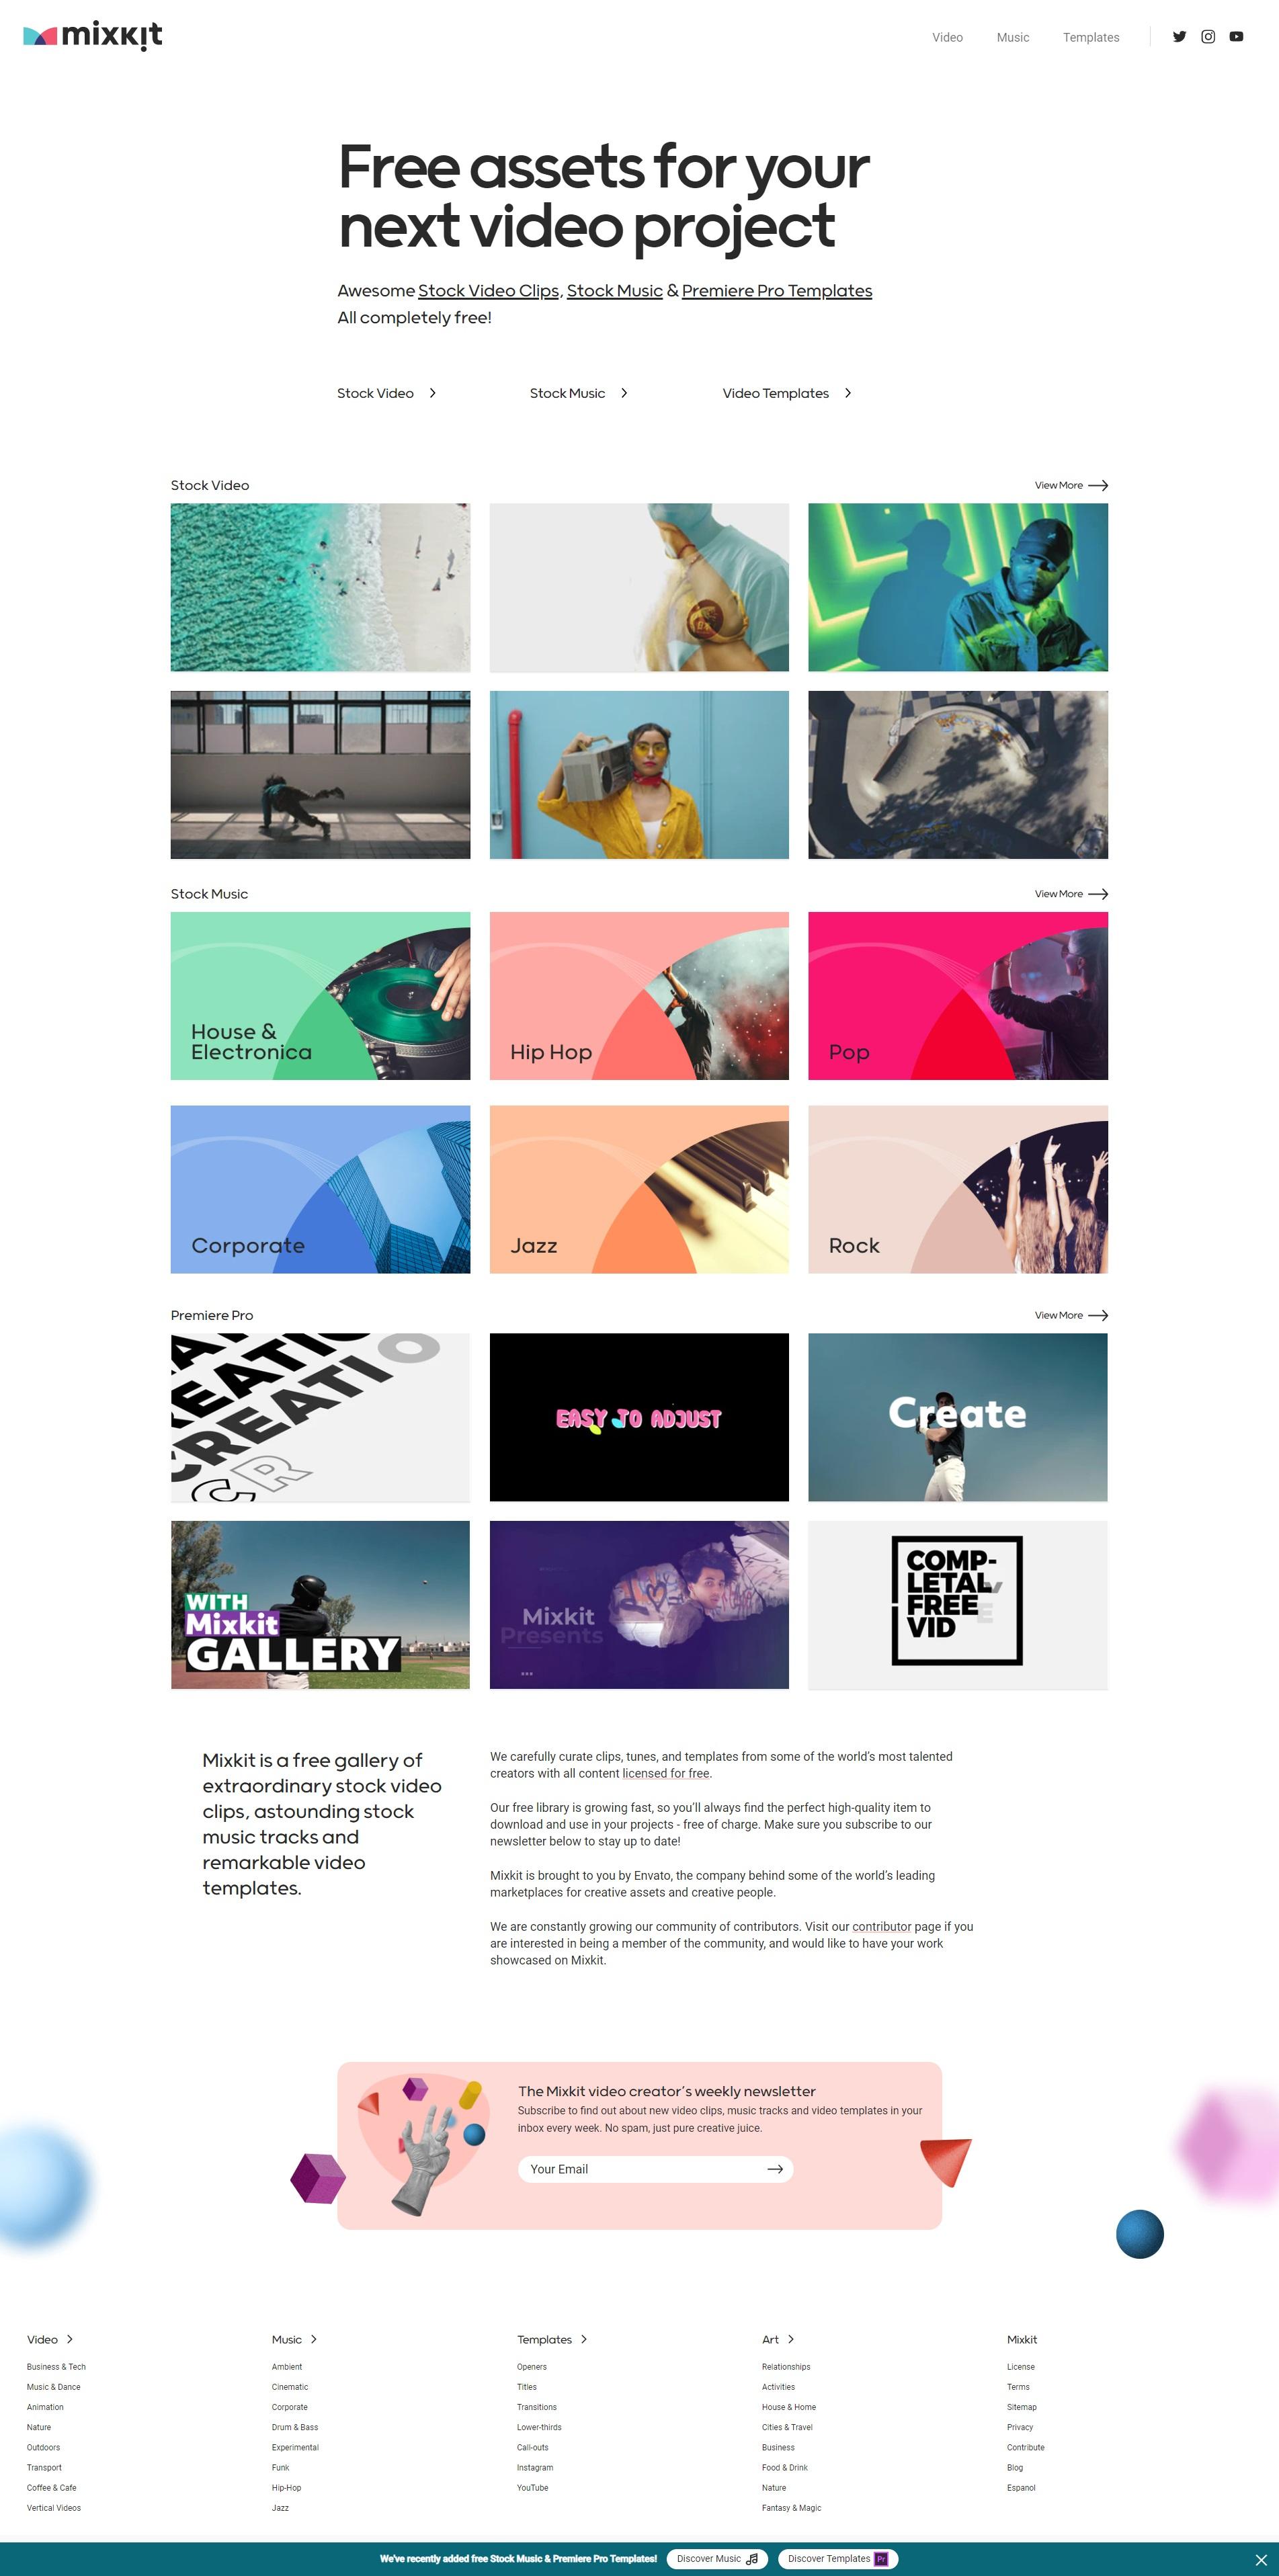 Mixkit - 免费无版权视频素材下载网站